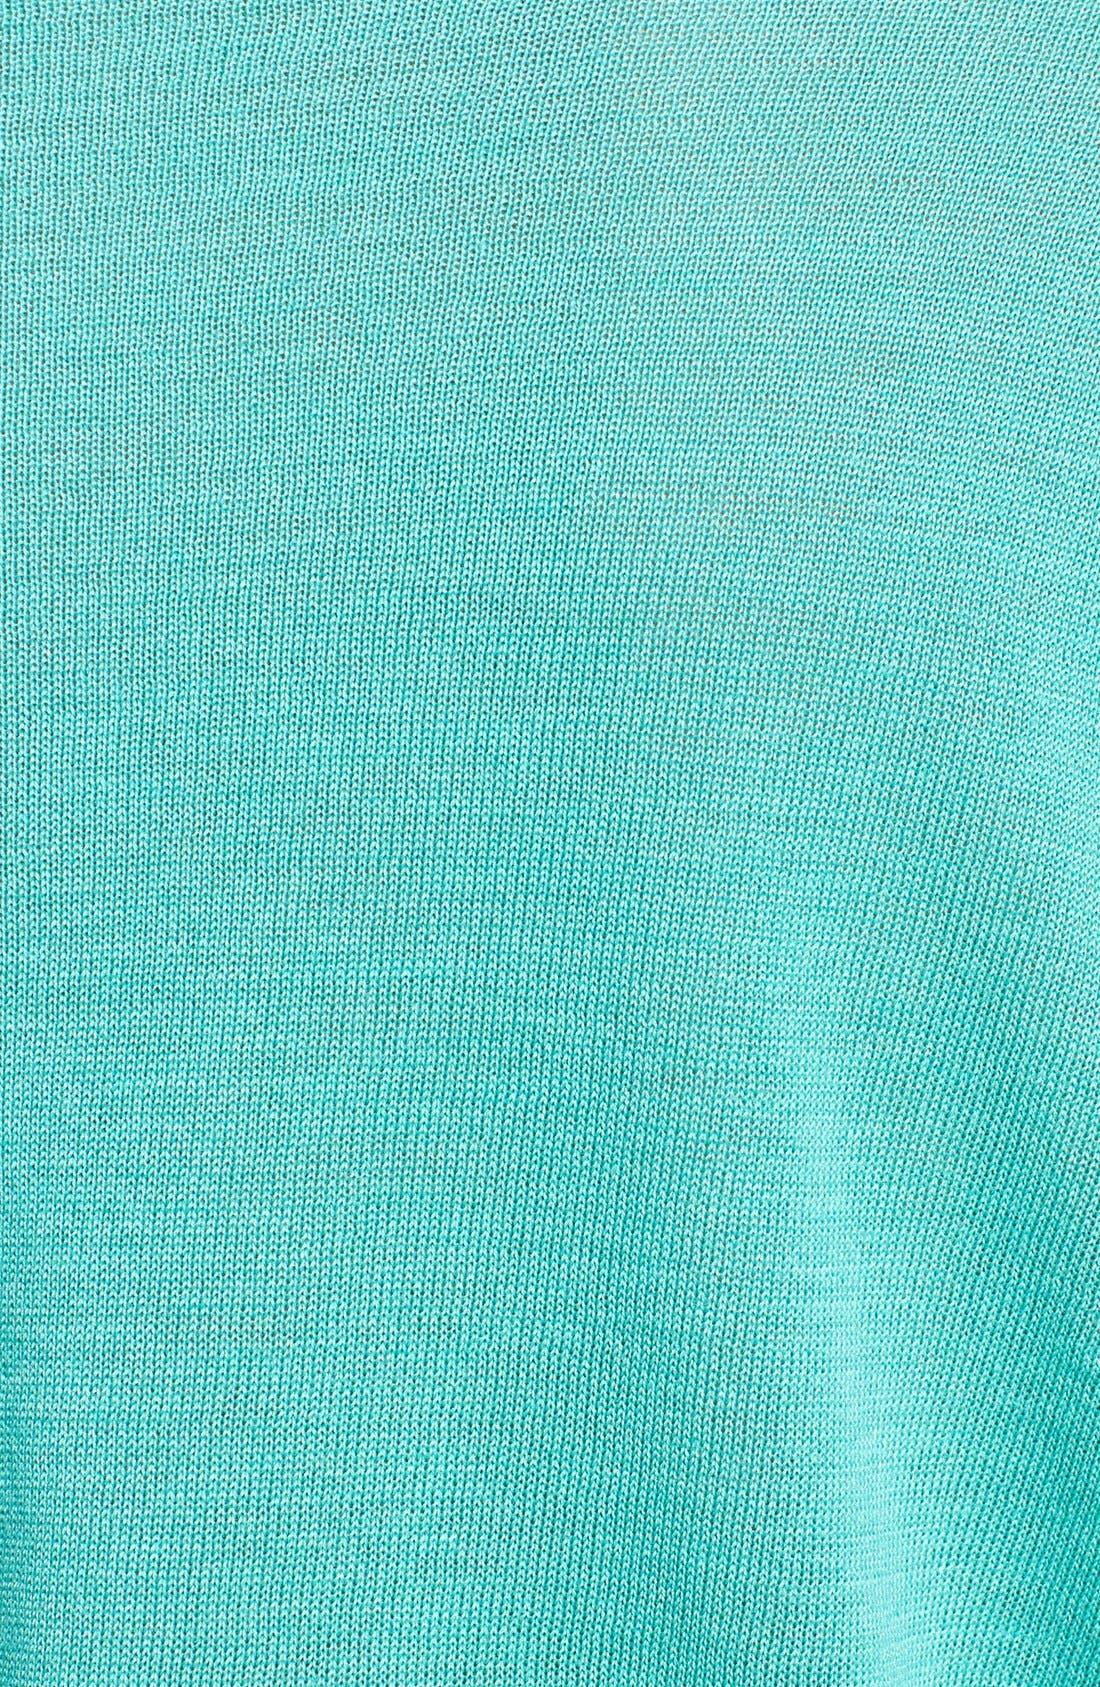 Alternate Image 3  - Adrianna Papell Roll Tab Sleeve Pullover